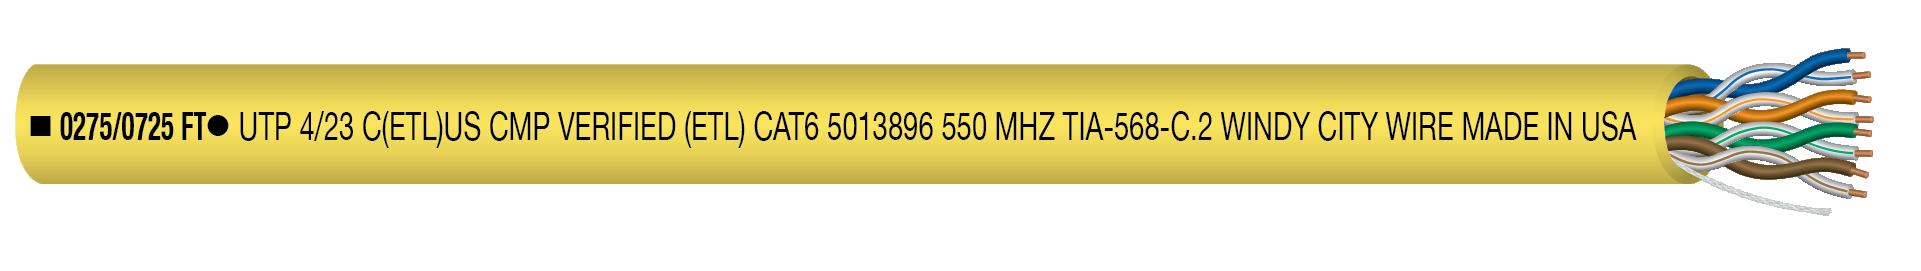 5566030